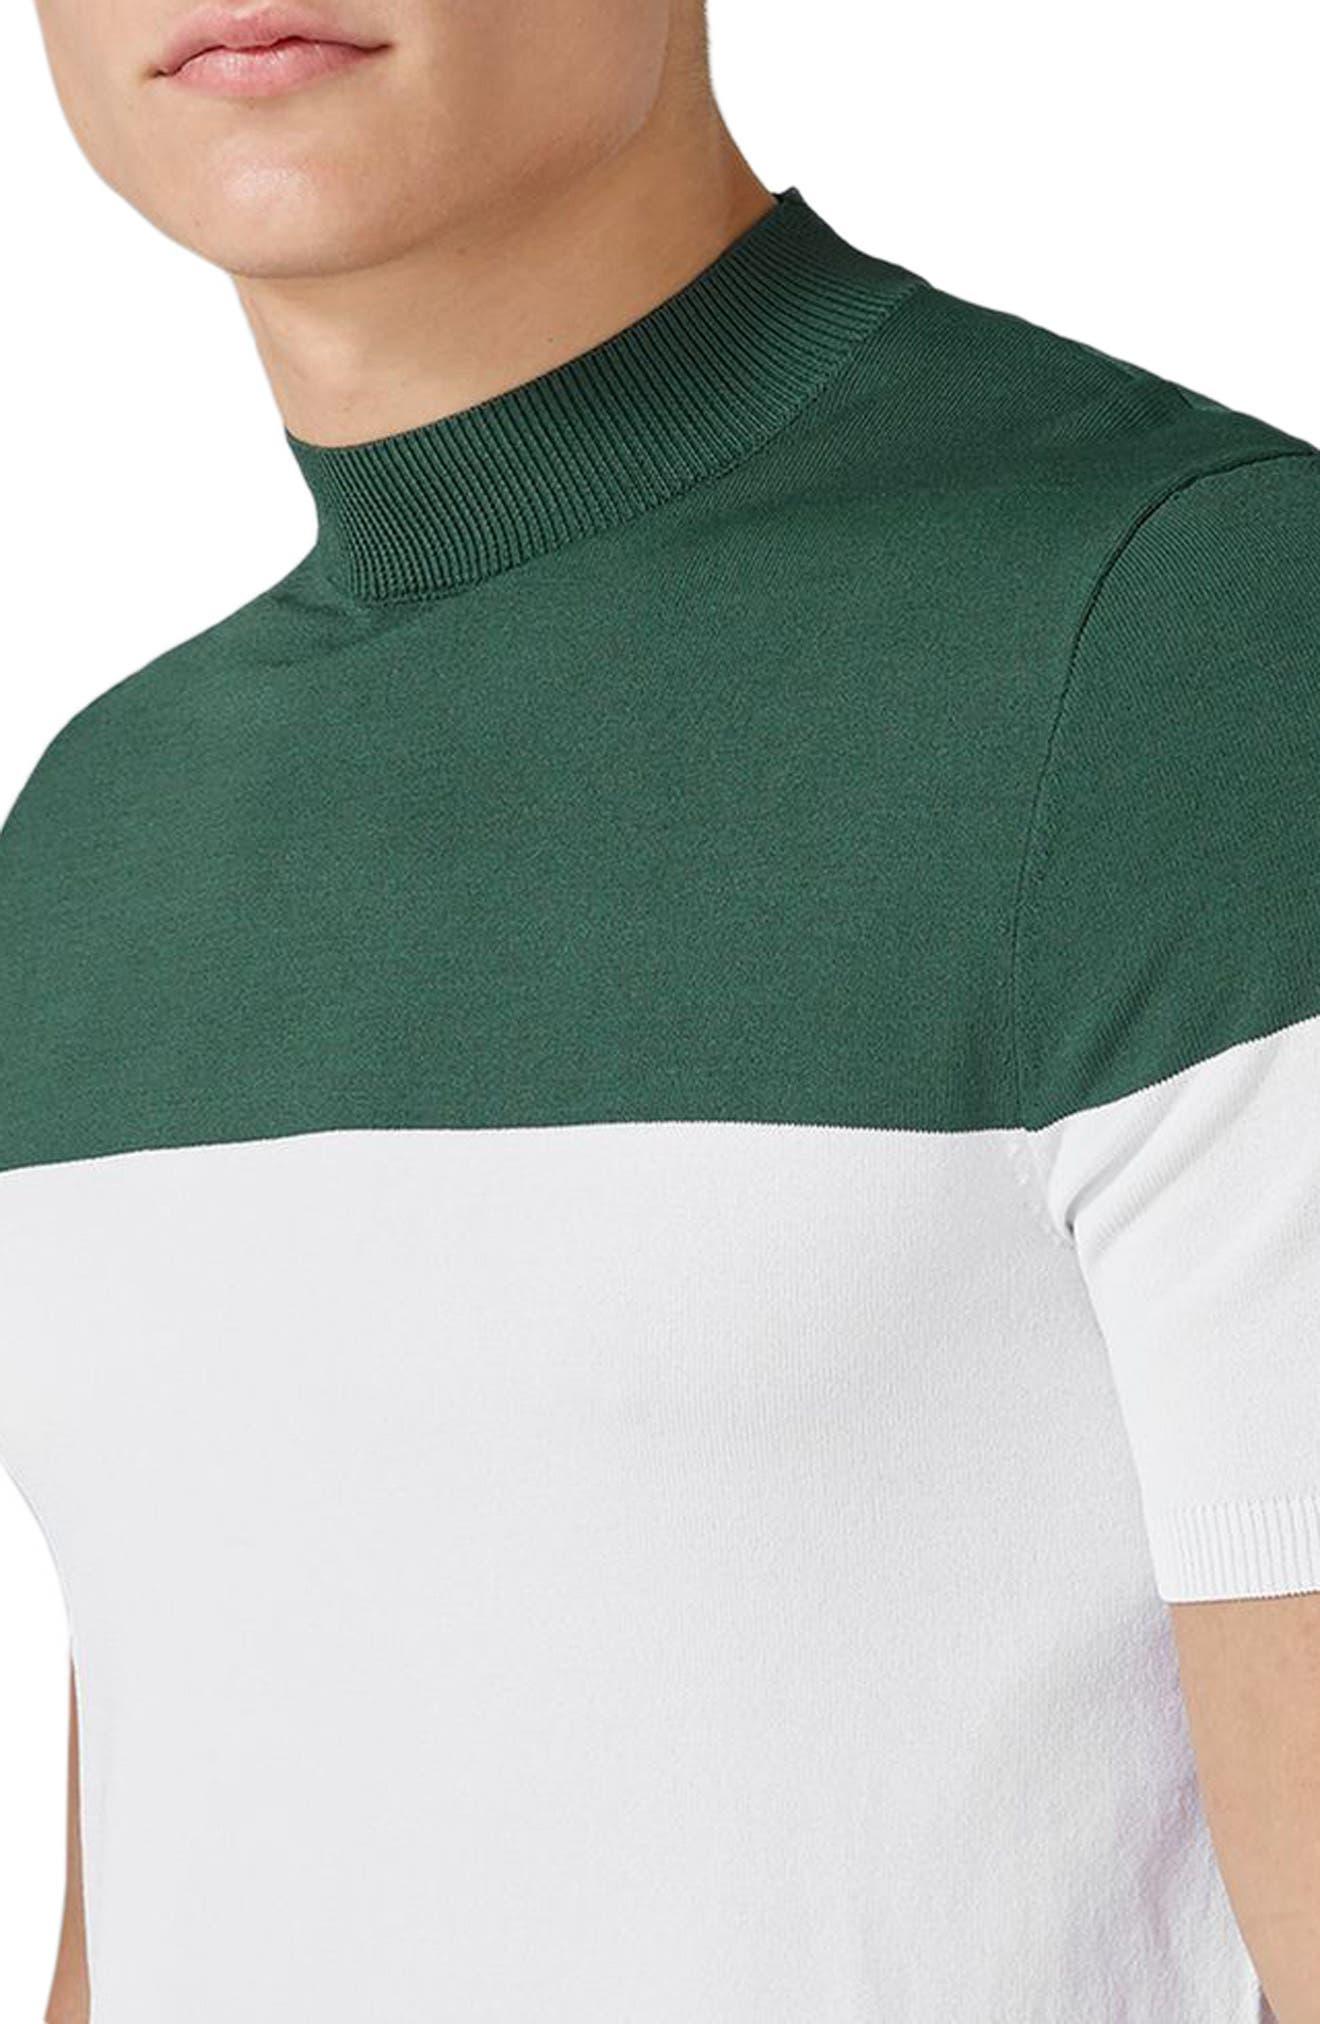 Colorblock Mock Neck Sweater,                             Alternate thumbnail 3, color,                             Green Multi